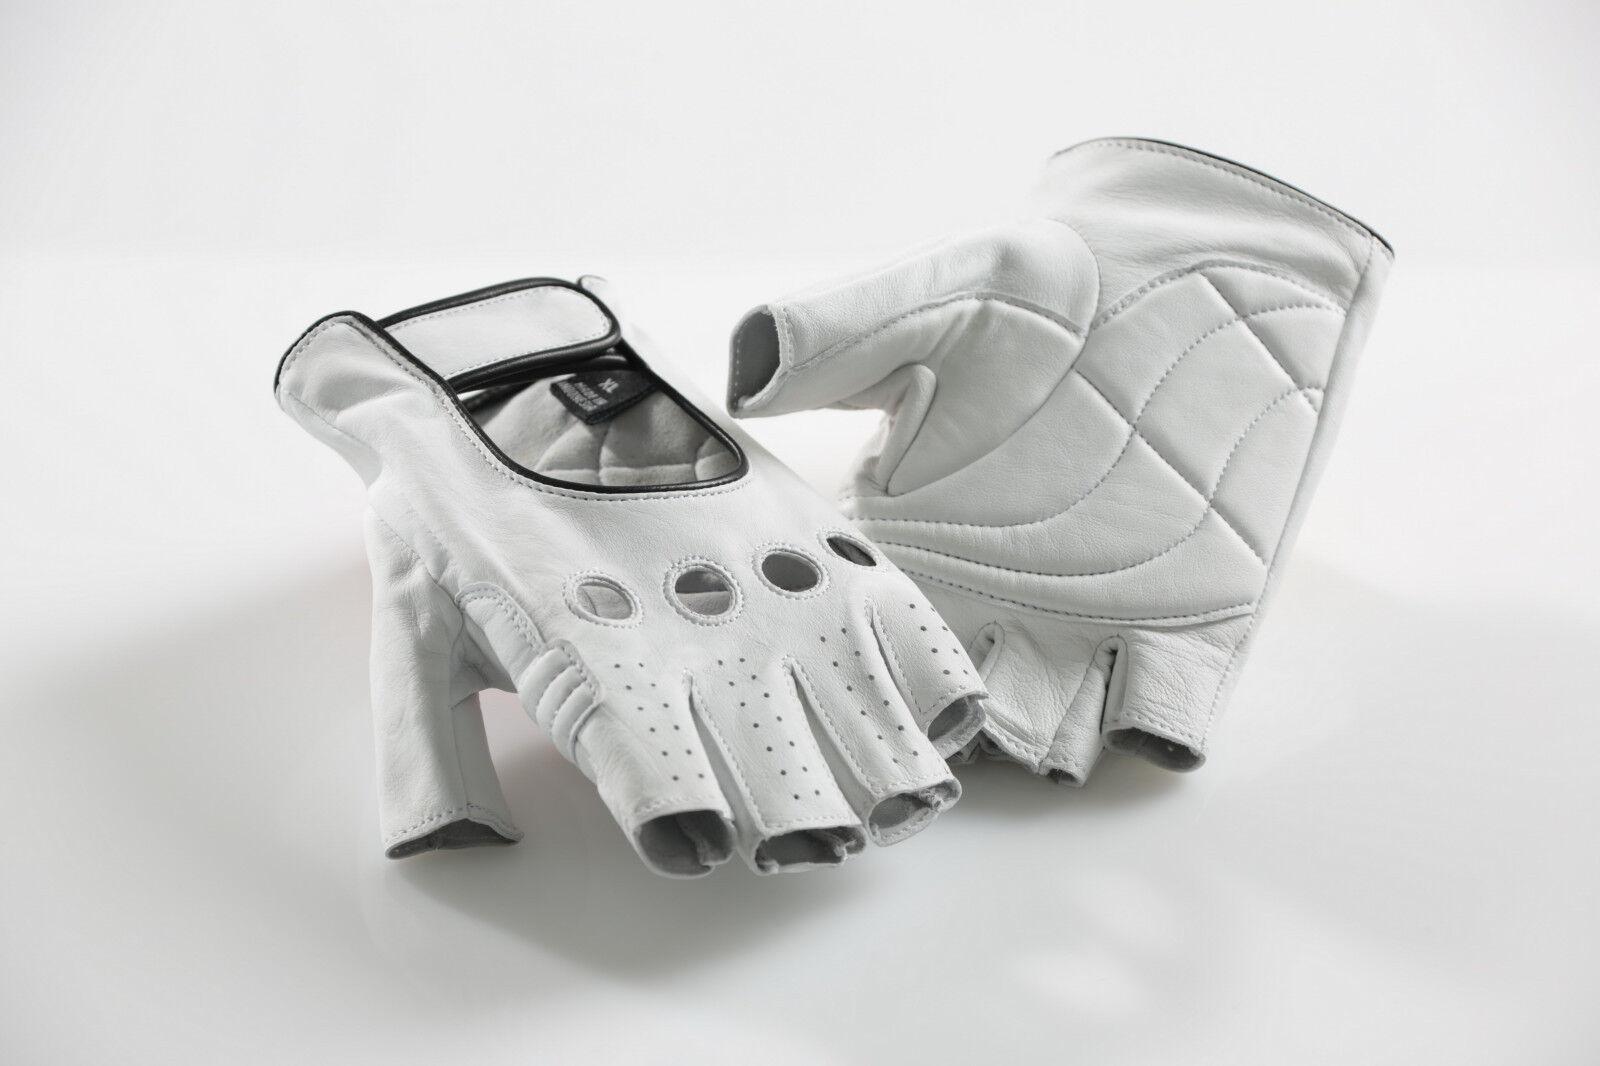 Cicli-Franconi Fahrrad Handschuhe Leder halbfinger weiß retro retro retro cycle gloves 2d2499